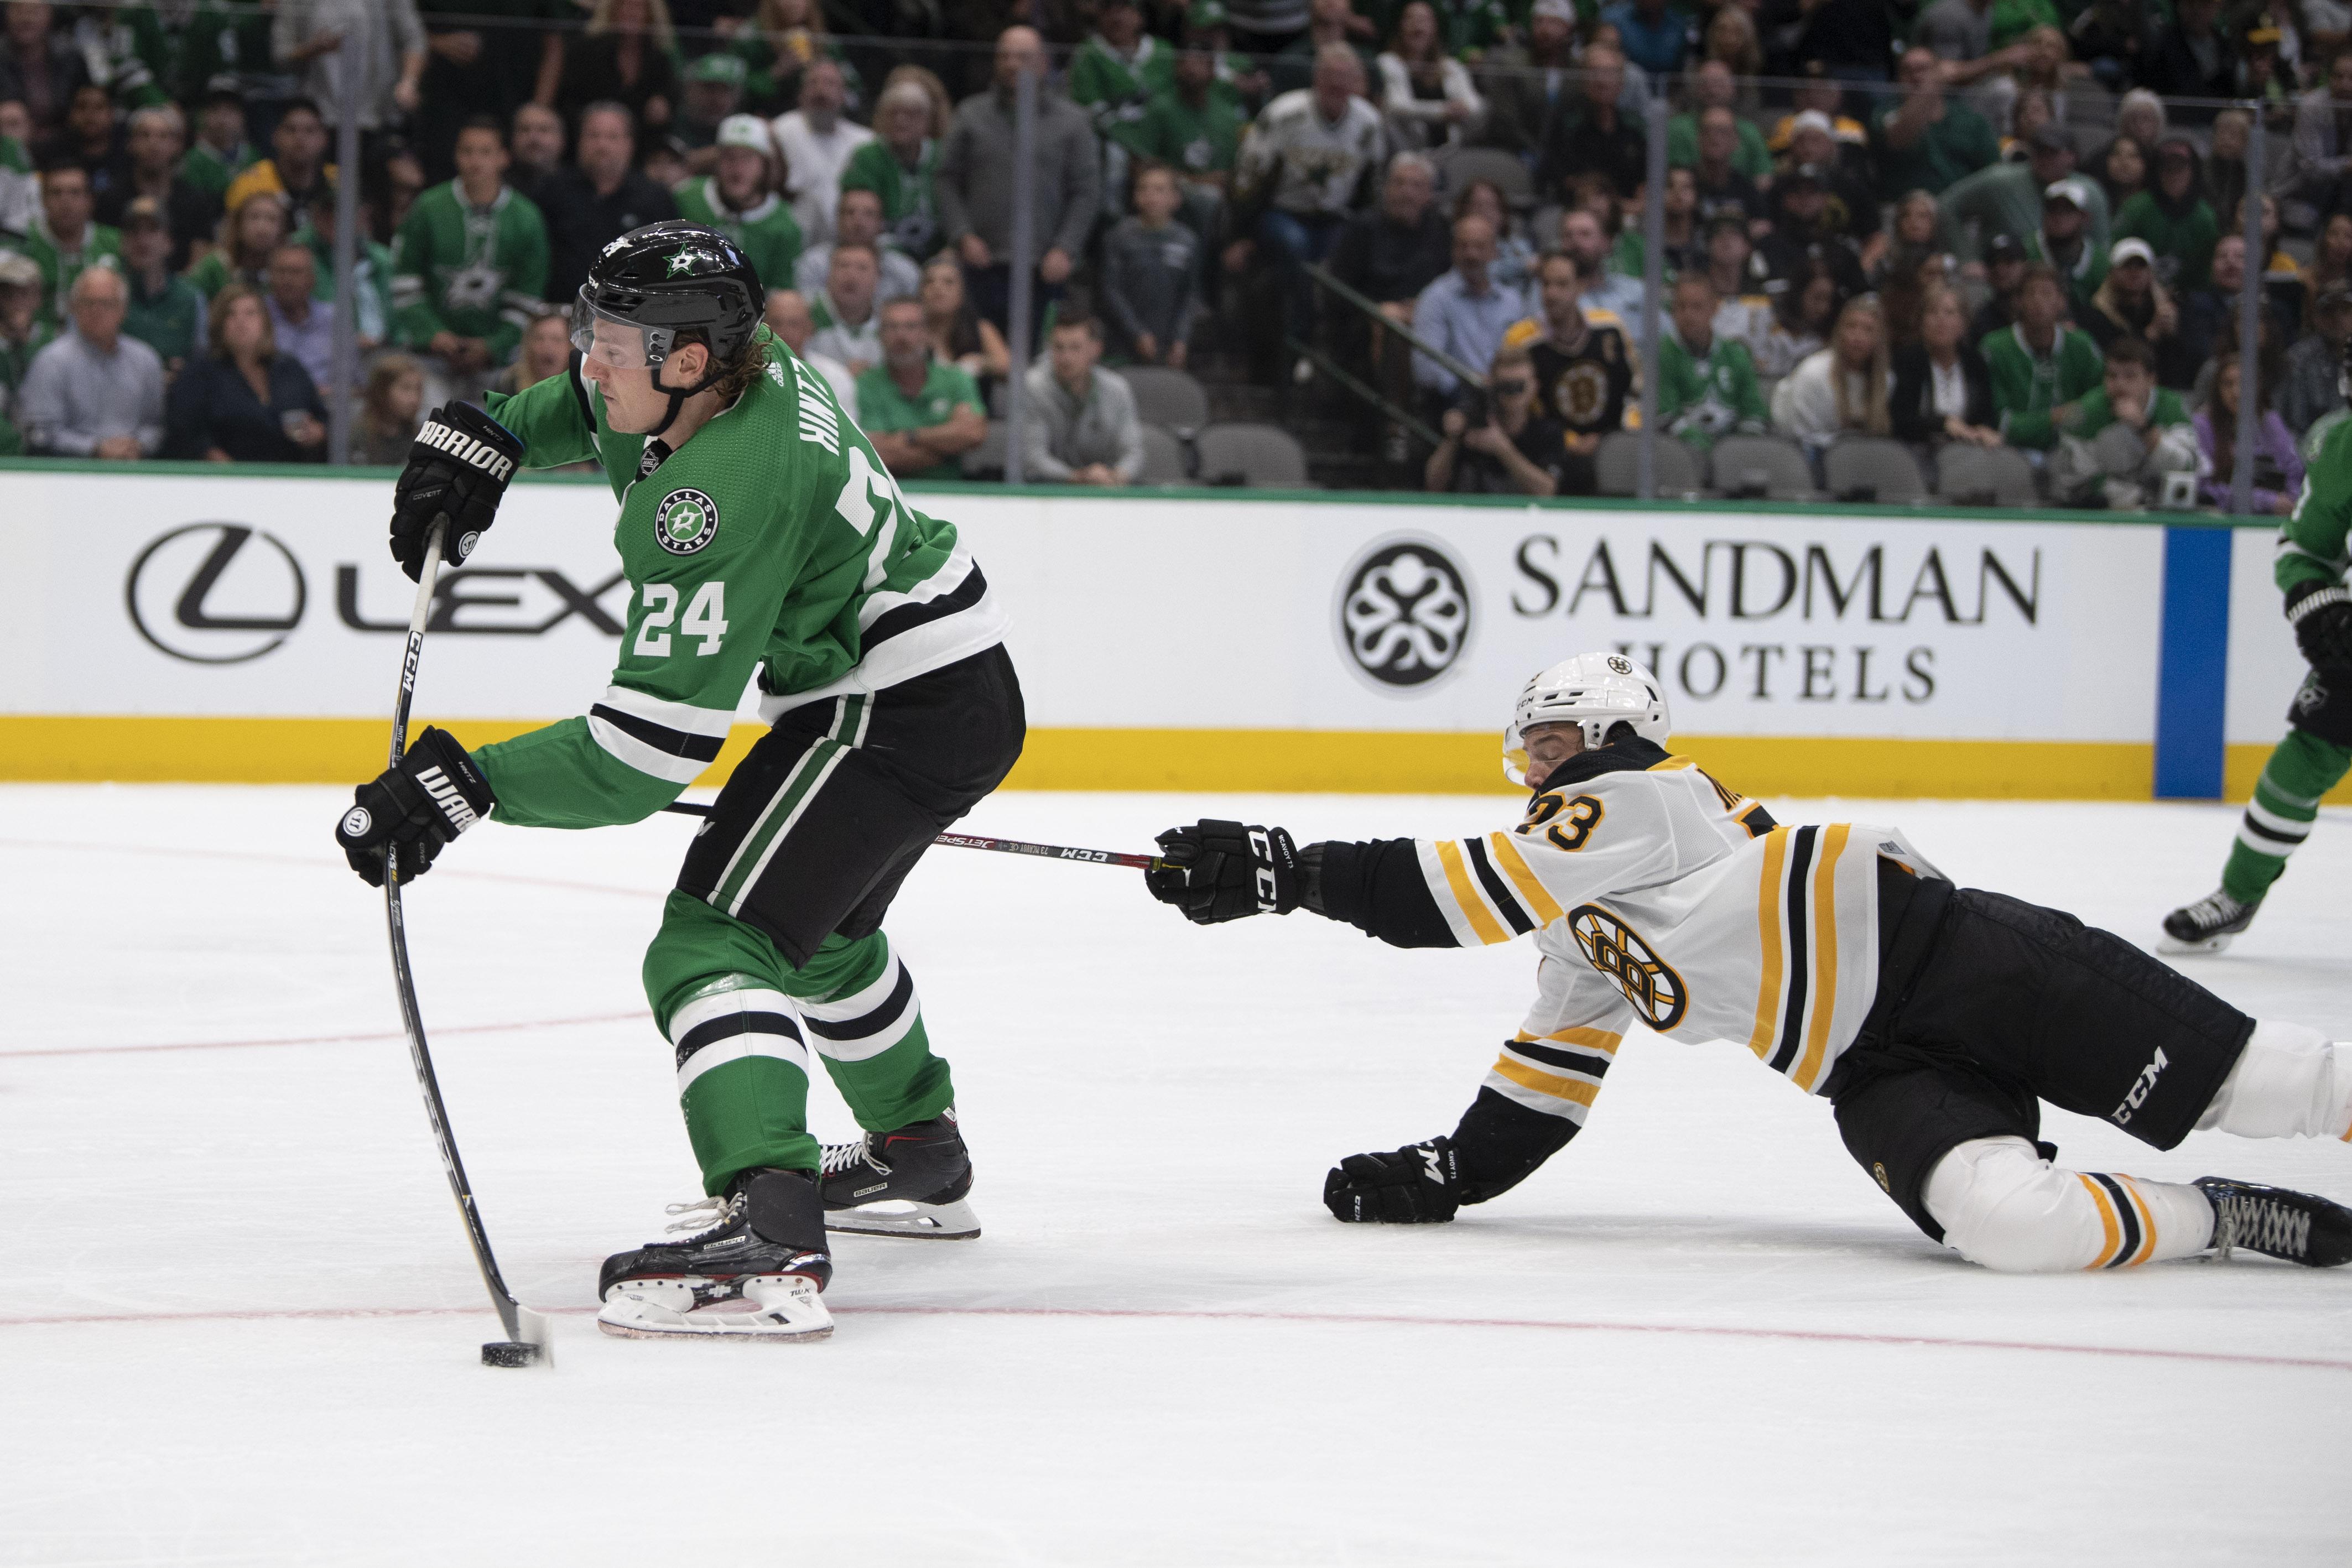 NHL: Boston Bruins at Dallas Stars